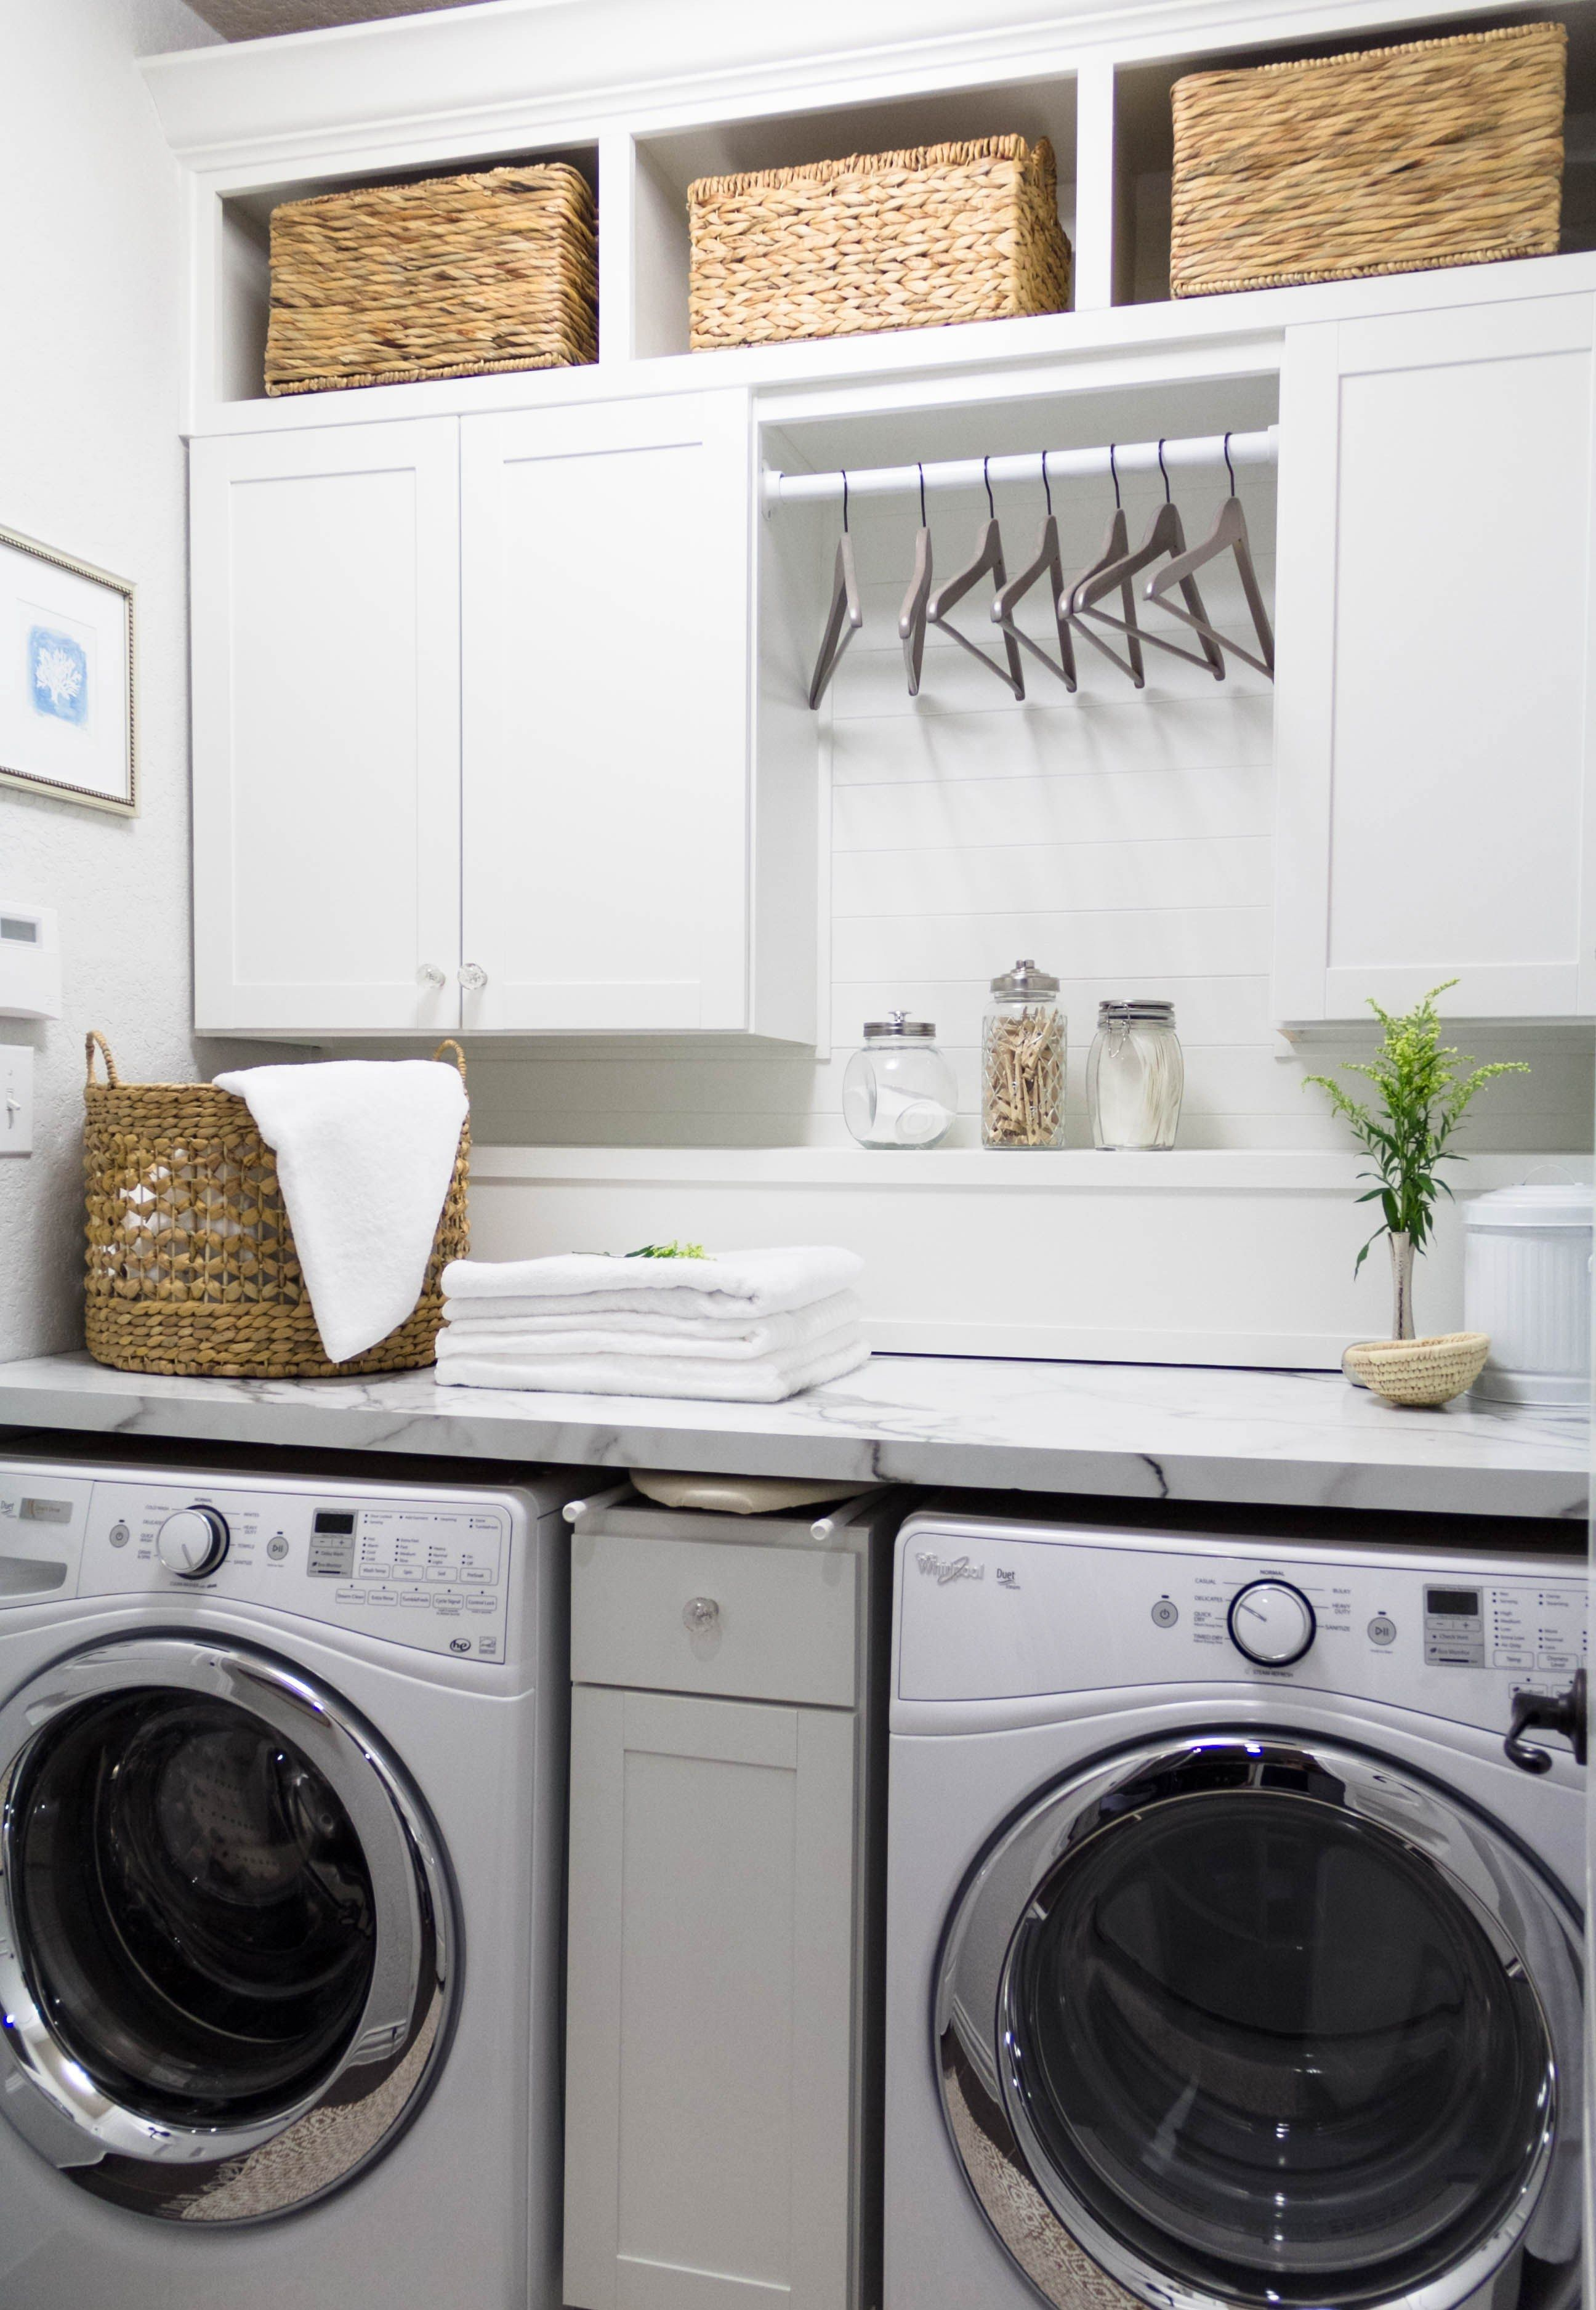 Basement Laundry Room Ideas Diy Design Space Saving Dream Homes How Unfinished Basement Ideas 787616075 Laundry